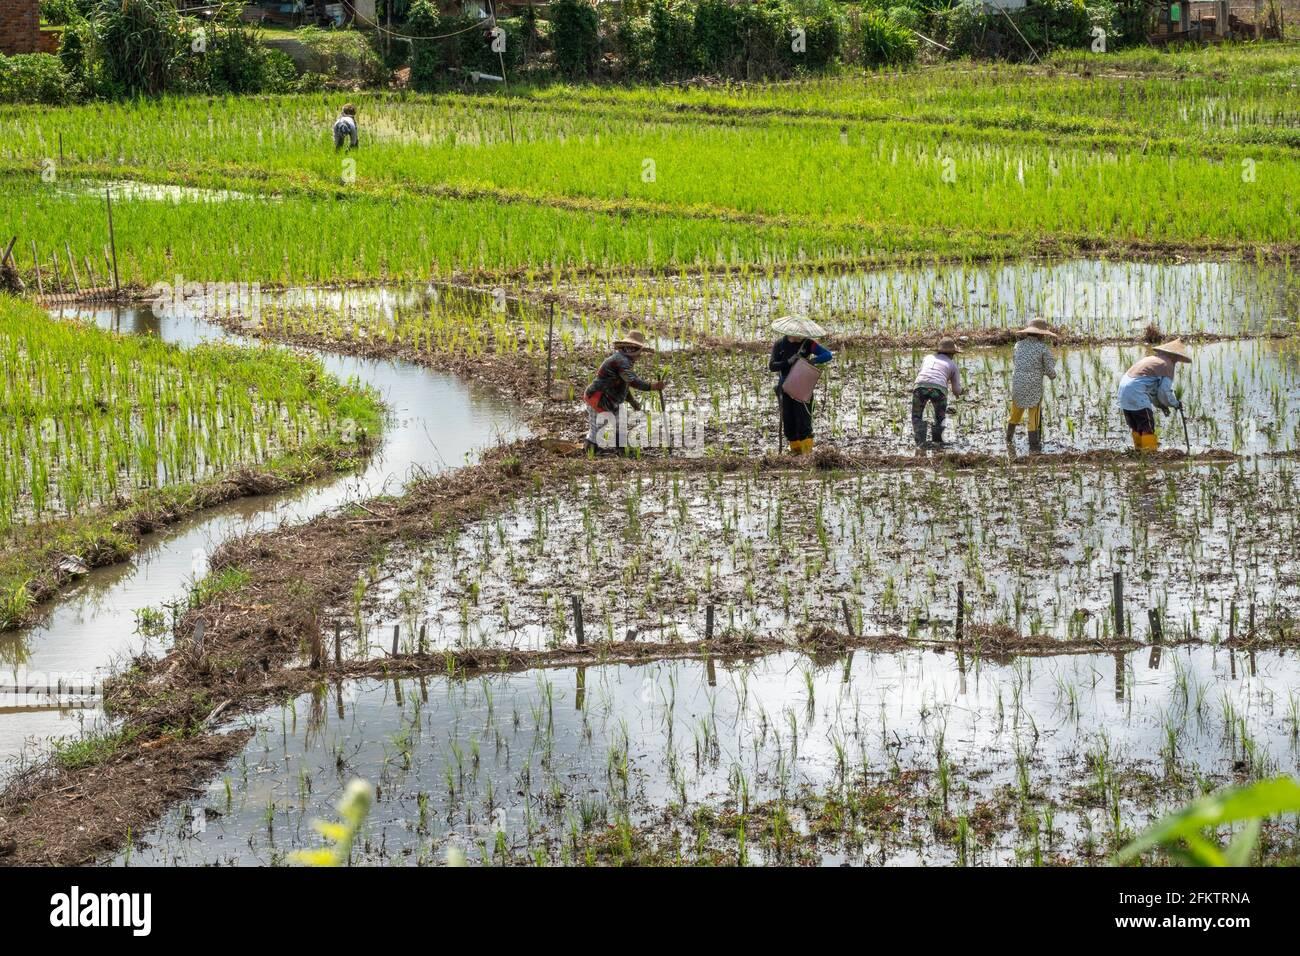 Rice field at Tebedu, Serian, Sarawak, East Malaysia Stock Photo